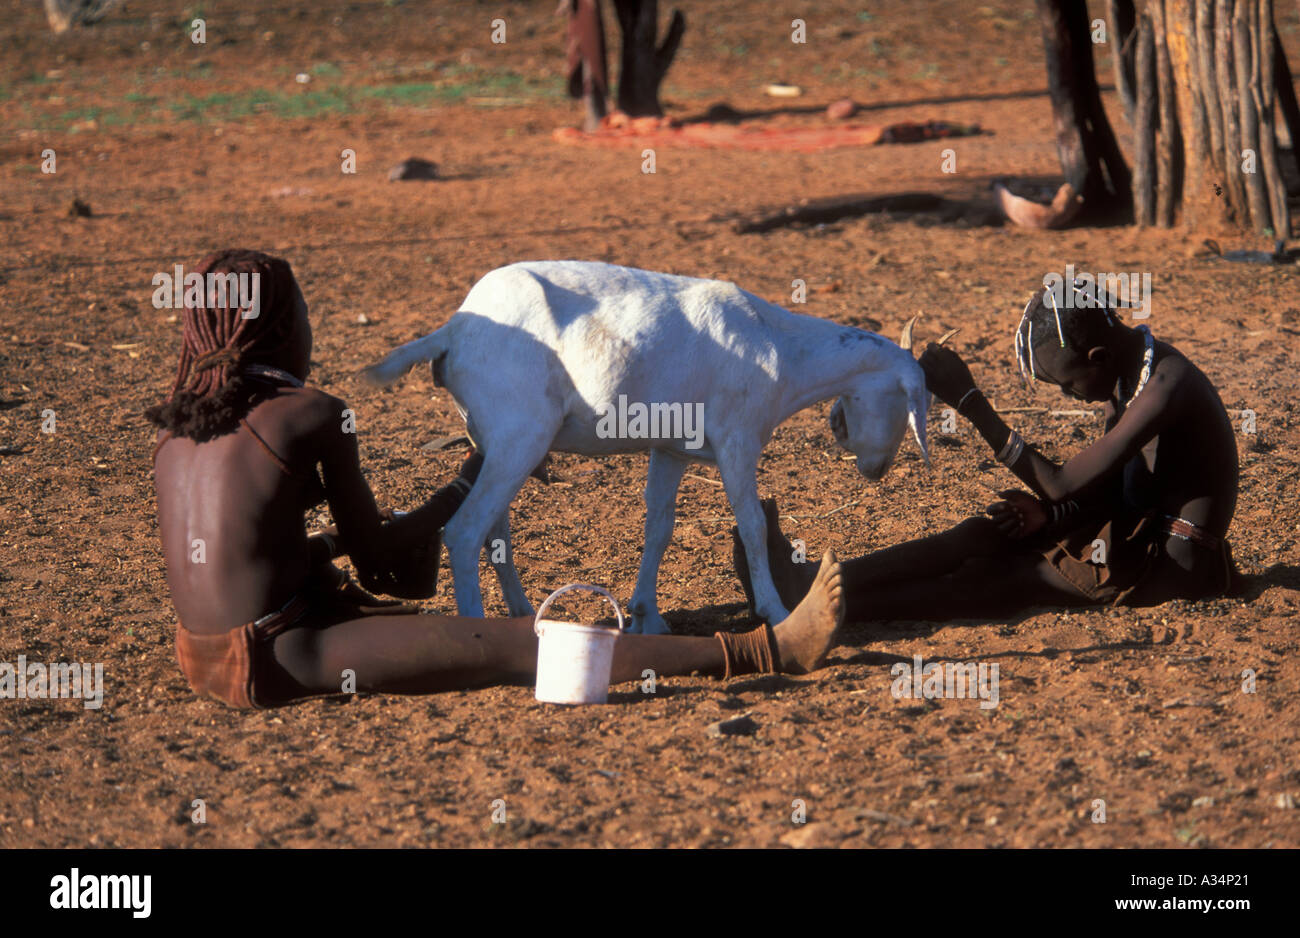 Himba Ovahimba tribe children milking goat inside Kraal gilr milking boy holding goat head Kaokoveld Namibia Africa - Stock Image